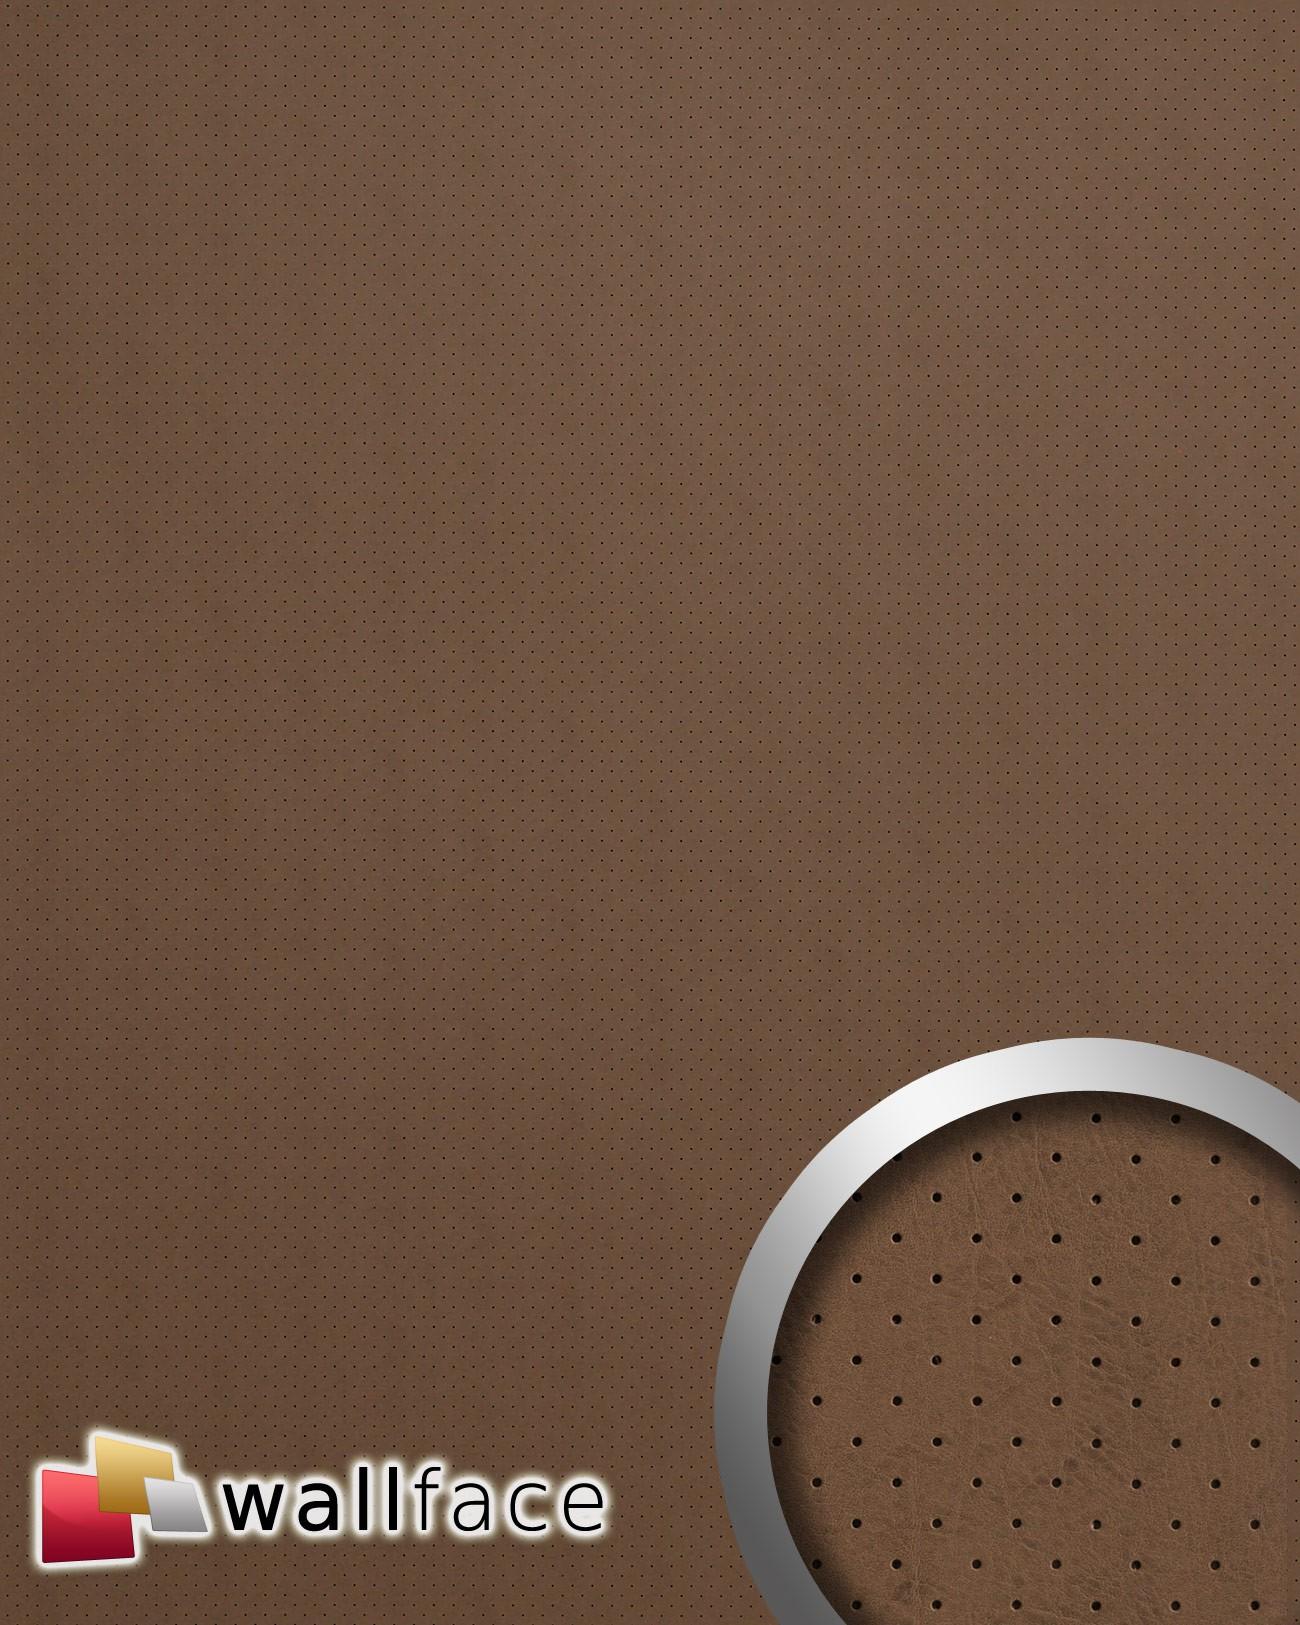 Panou Decorativ Leather 15286  Wallface  Autocolan